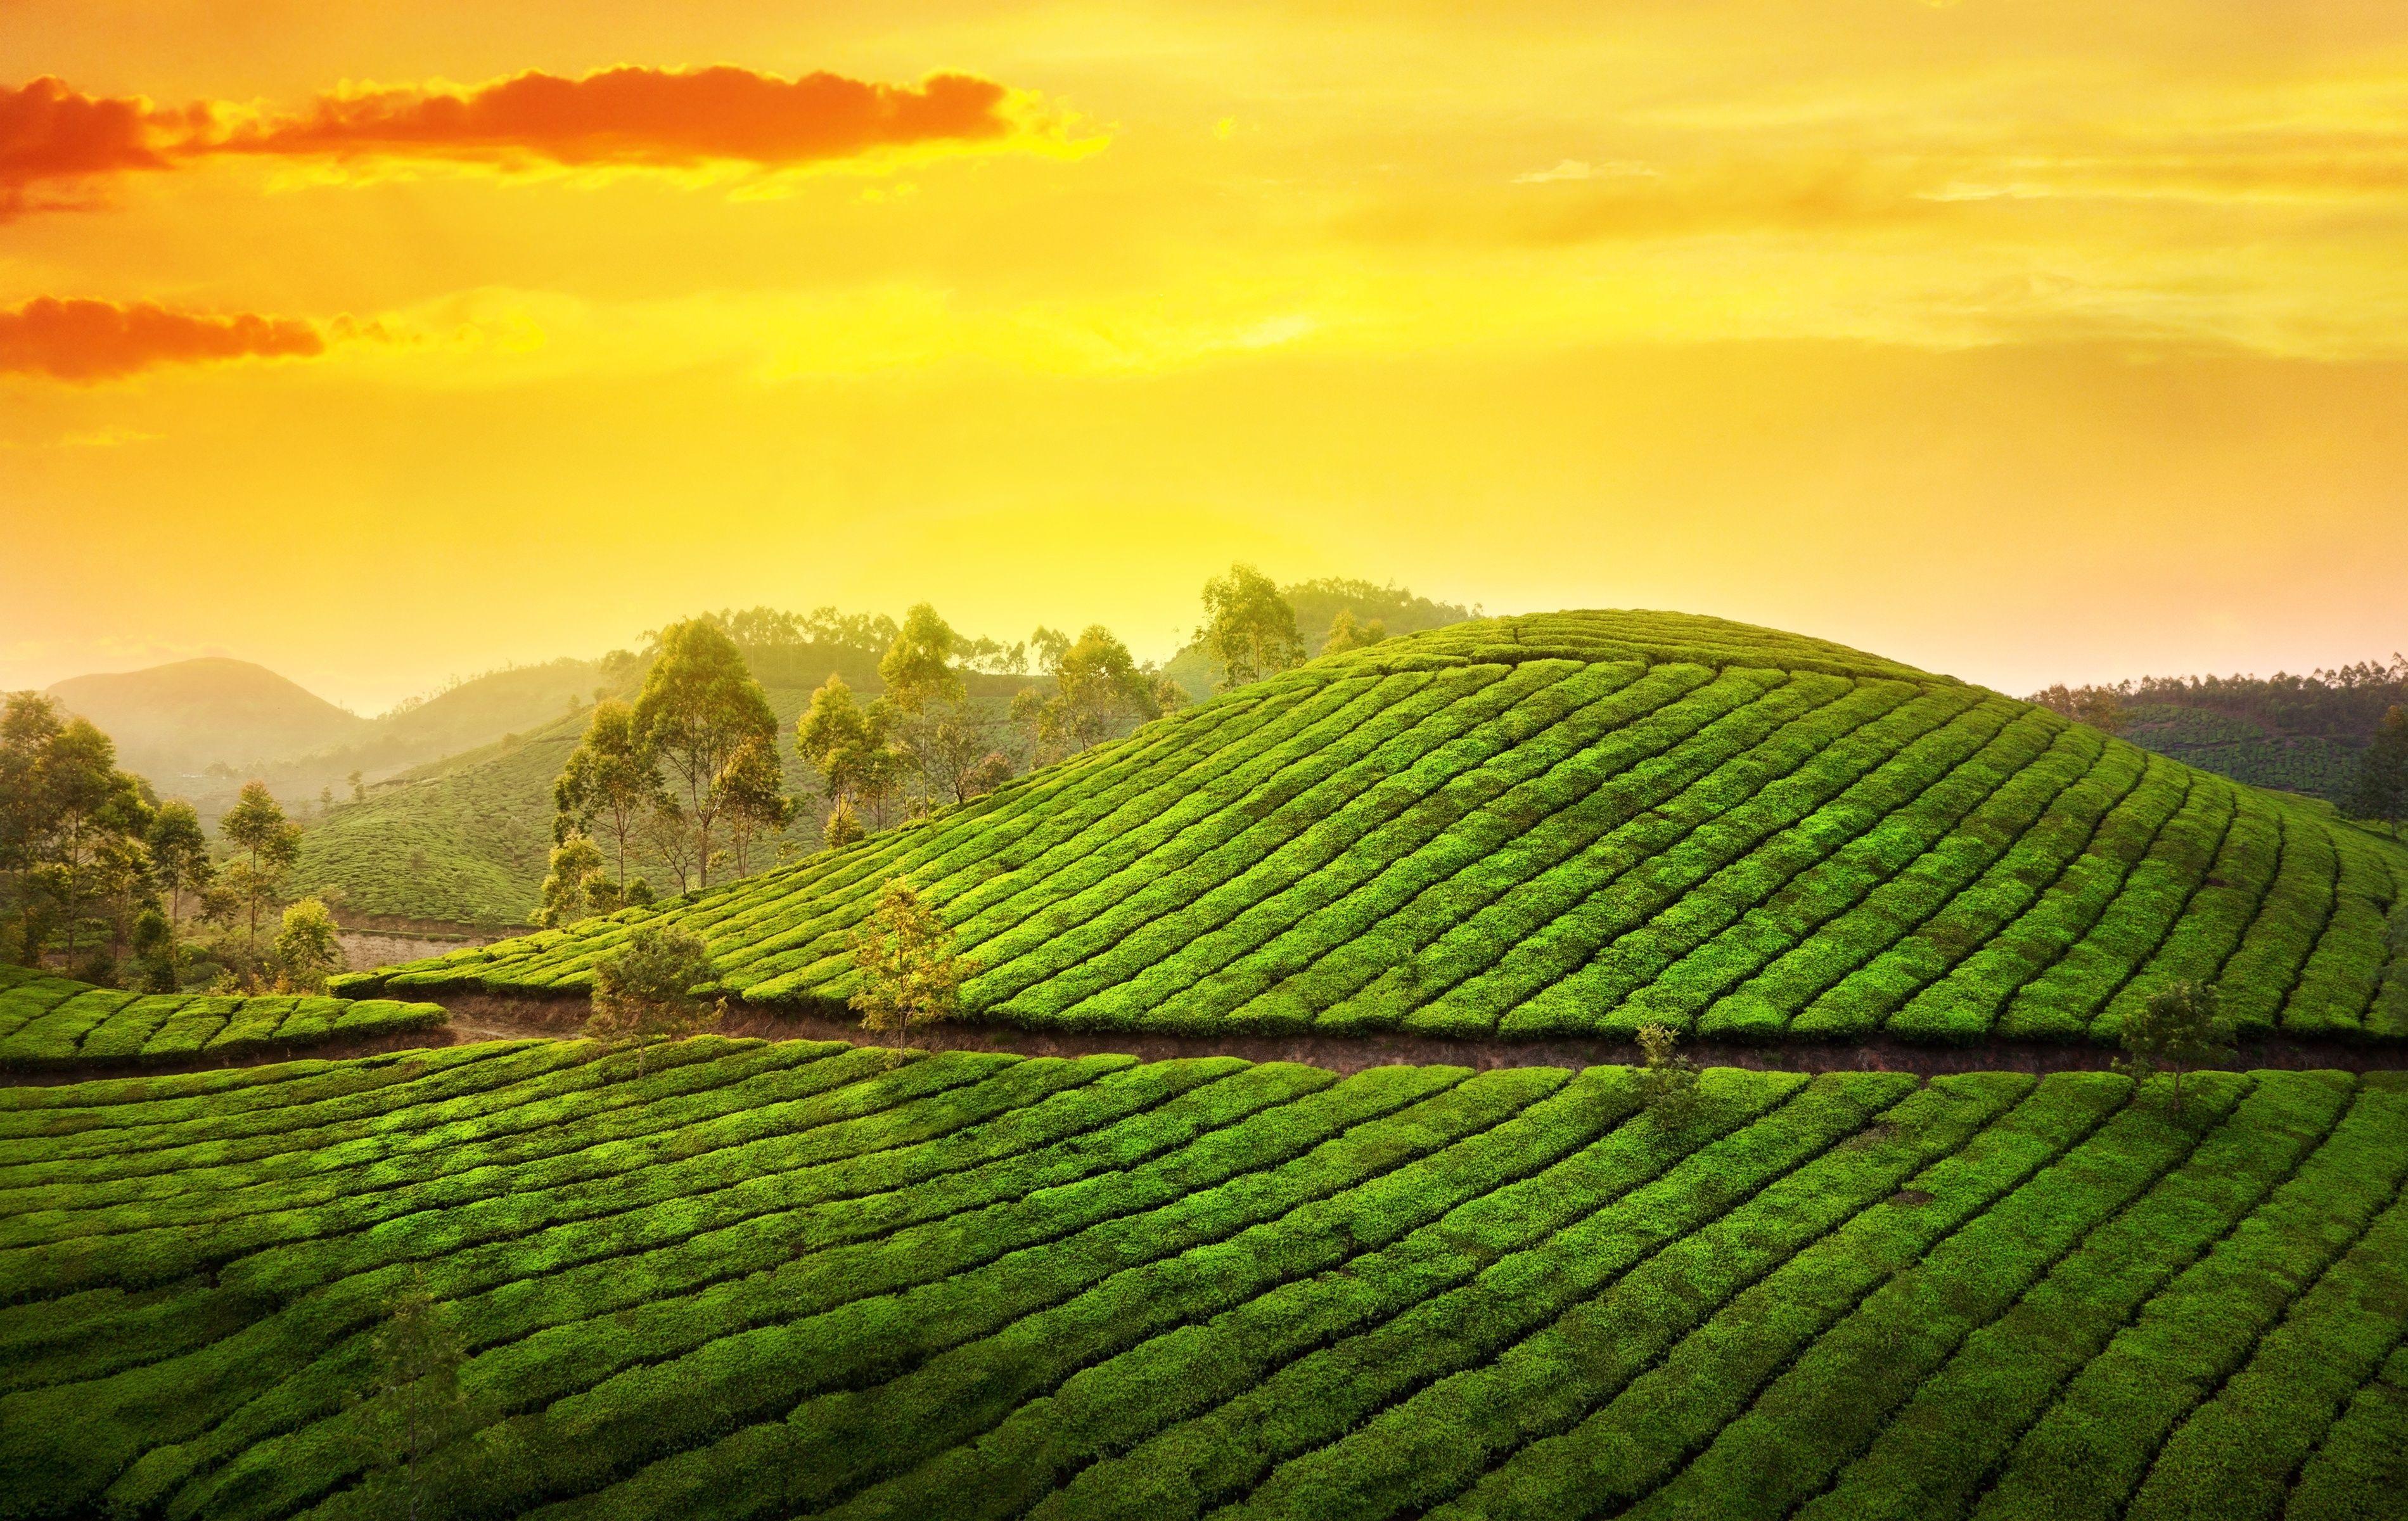 Download wallpaper munnar, kerala, india, munnar, kerala